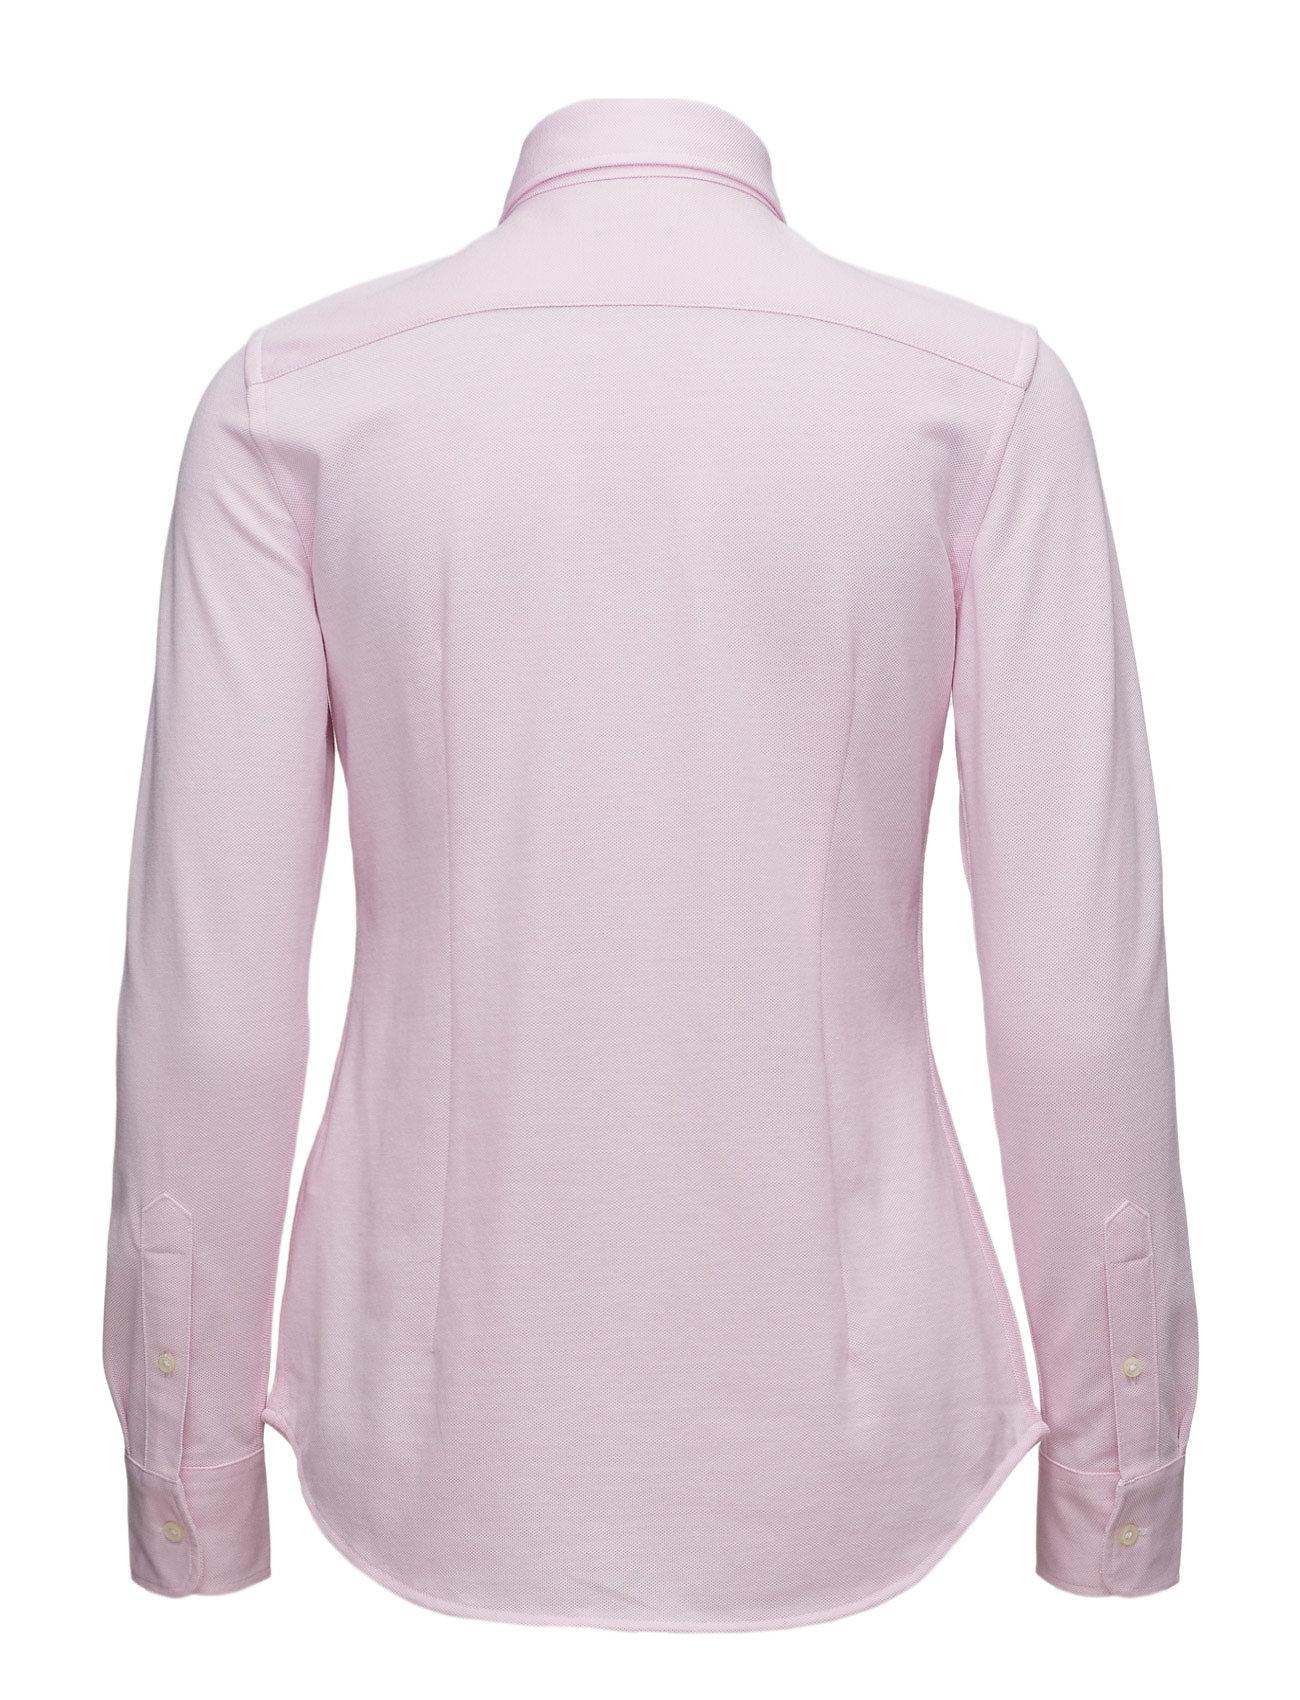 Fit PinkPolo Slim Shirtcarmel Oxford Ralph Lauren WHEIYeD29b